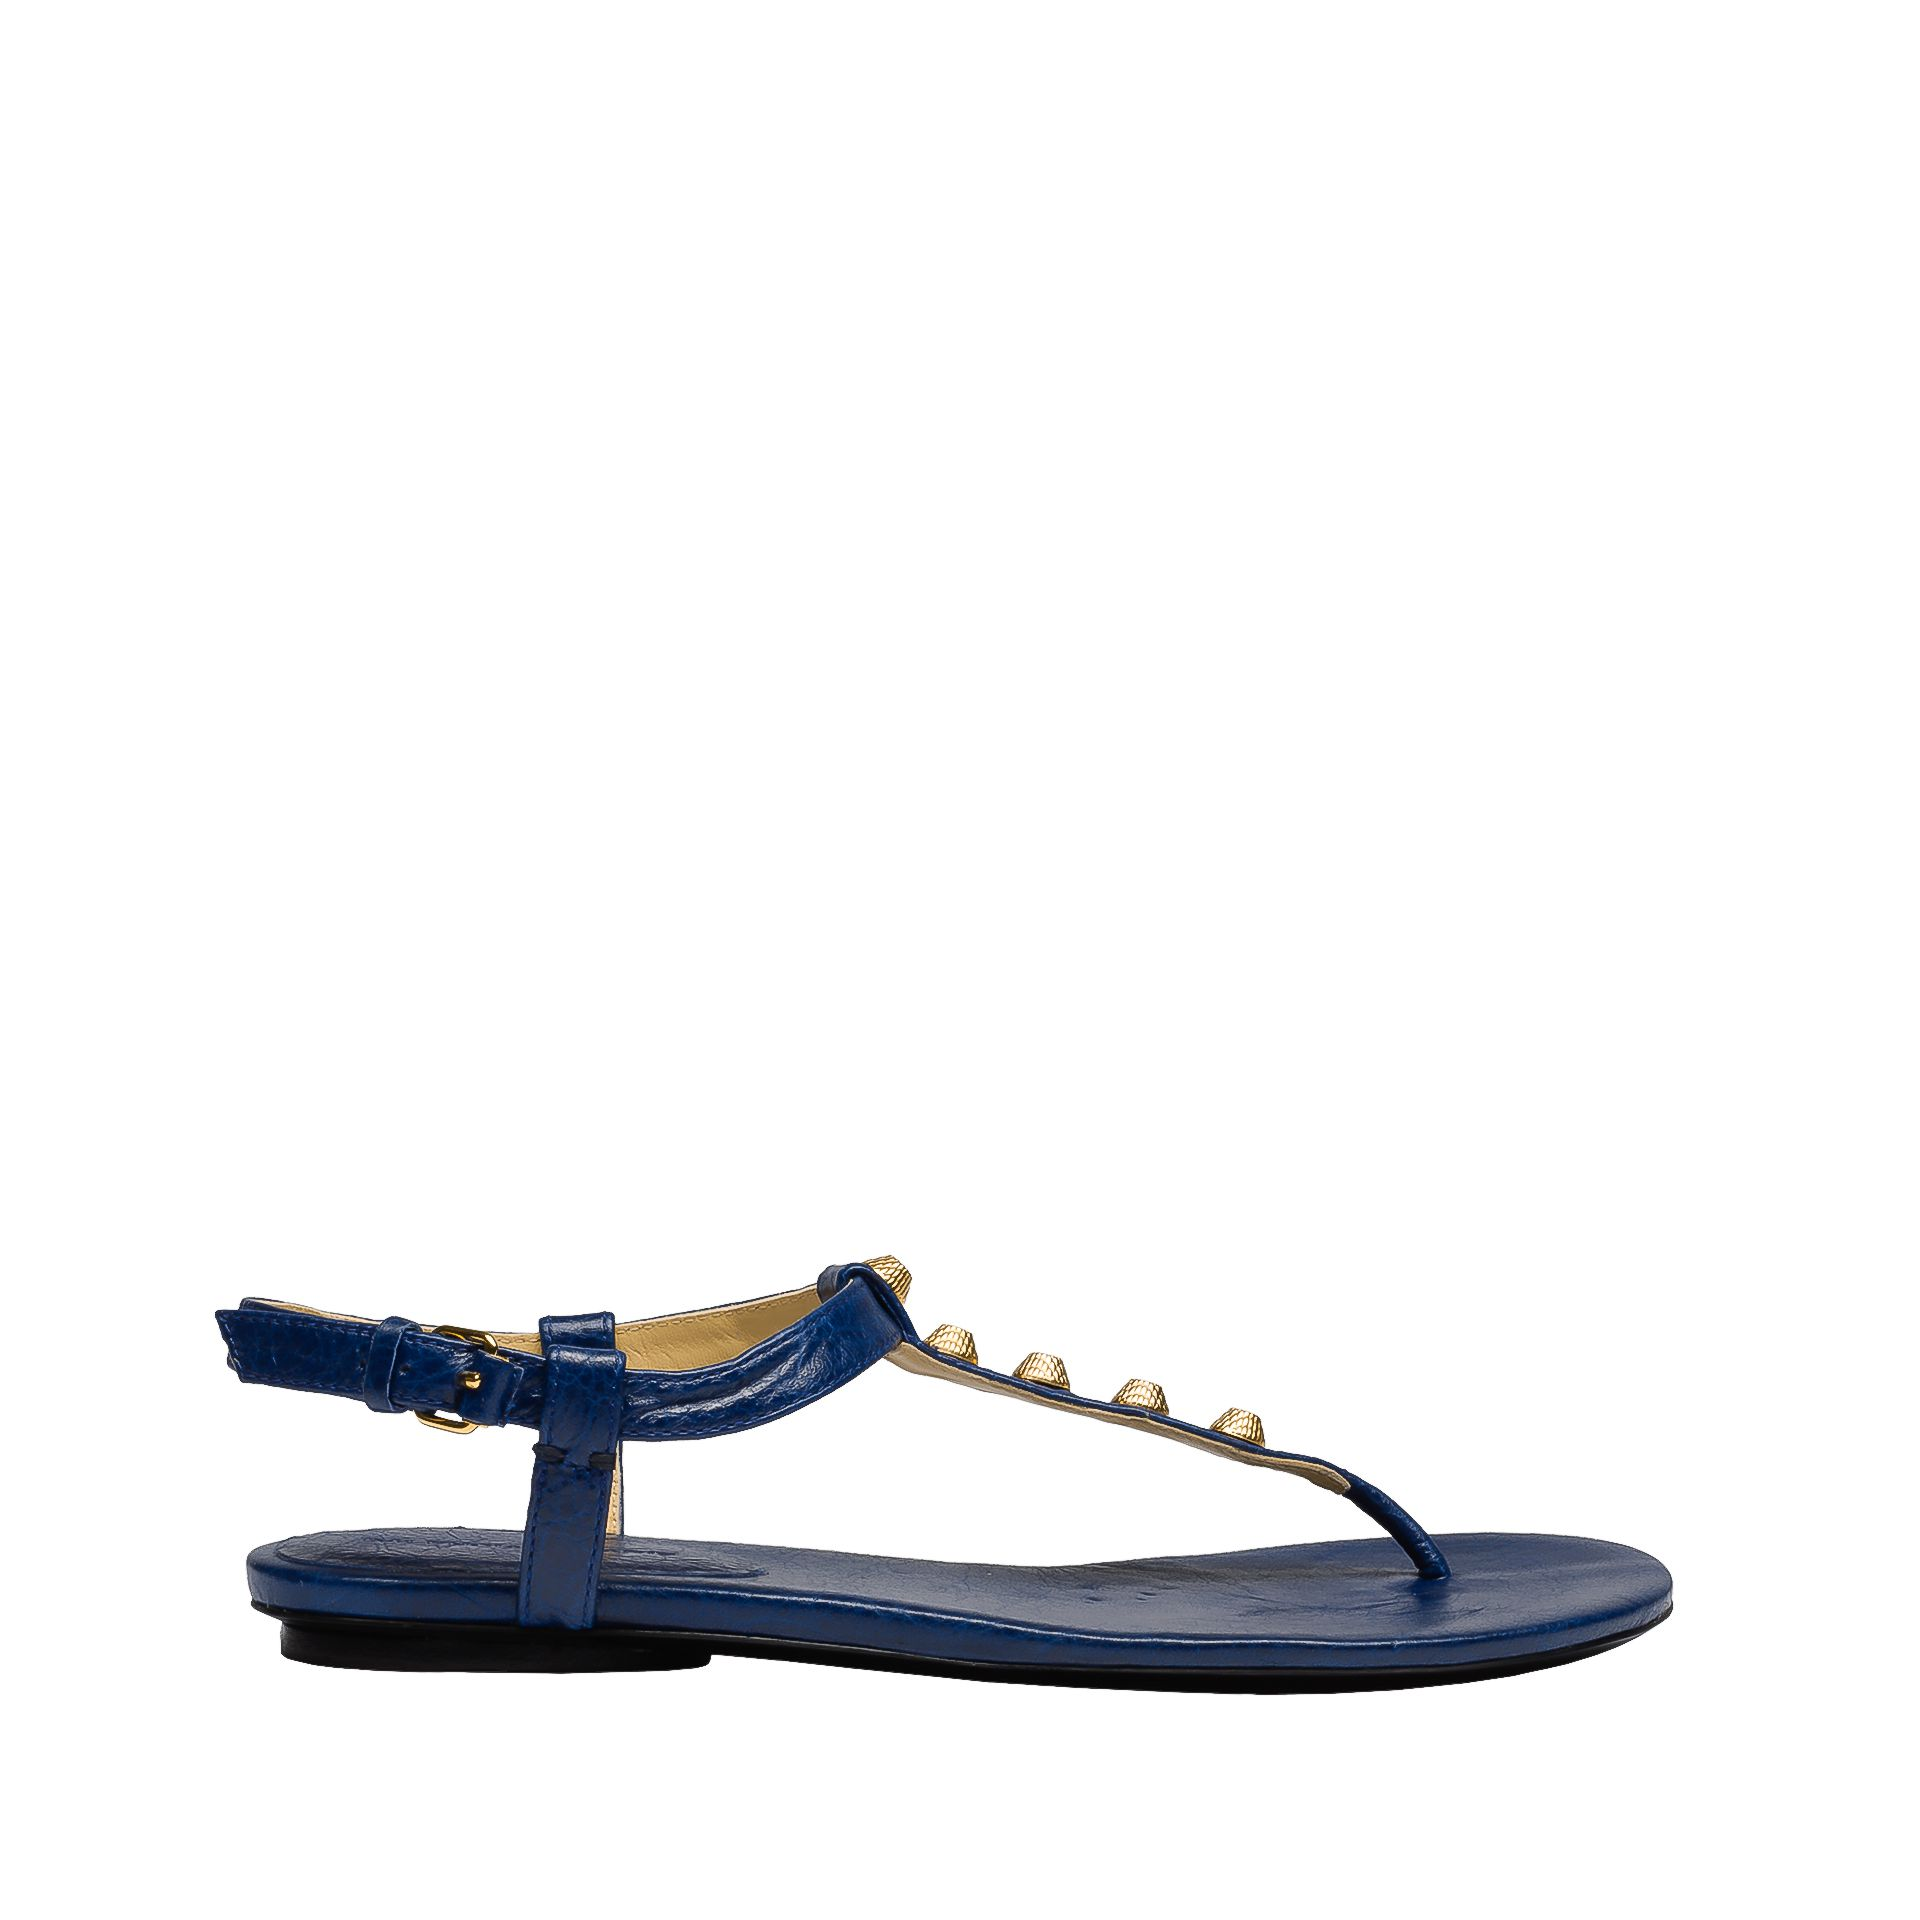 Balenciaga Giant Sandales Entredoigts Plates Or